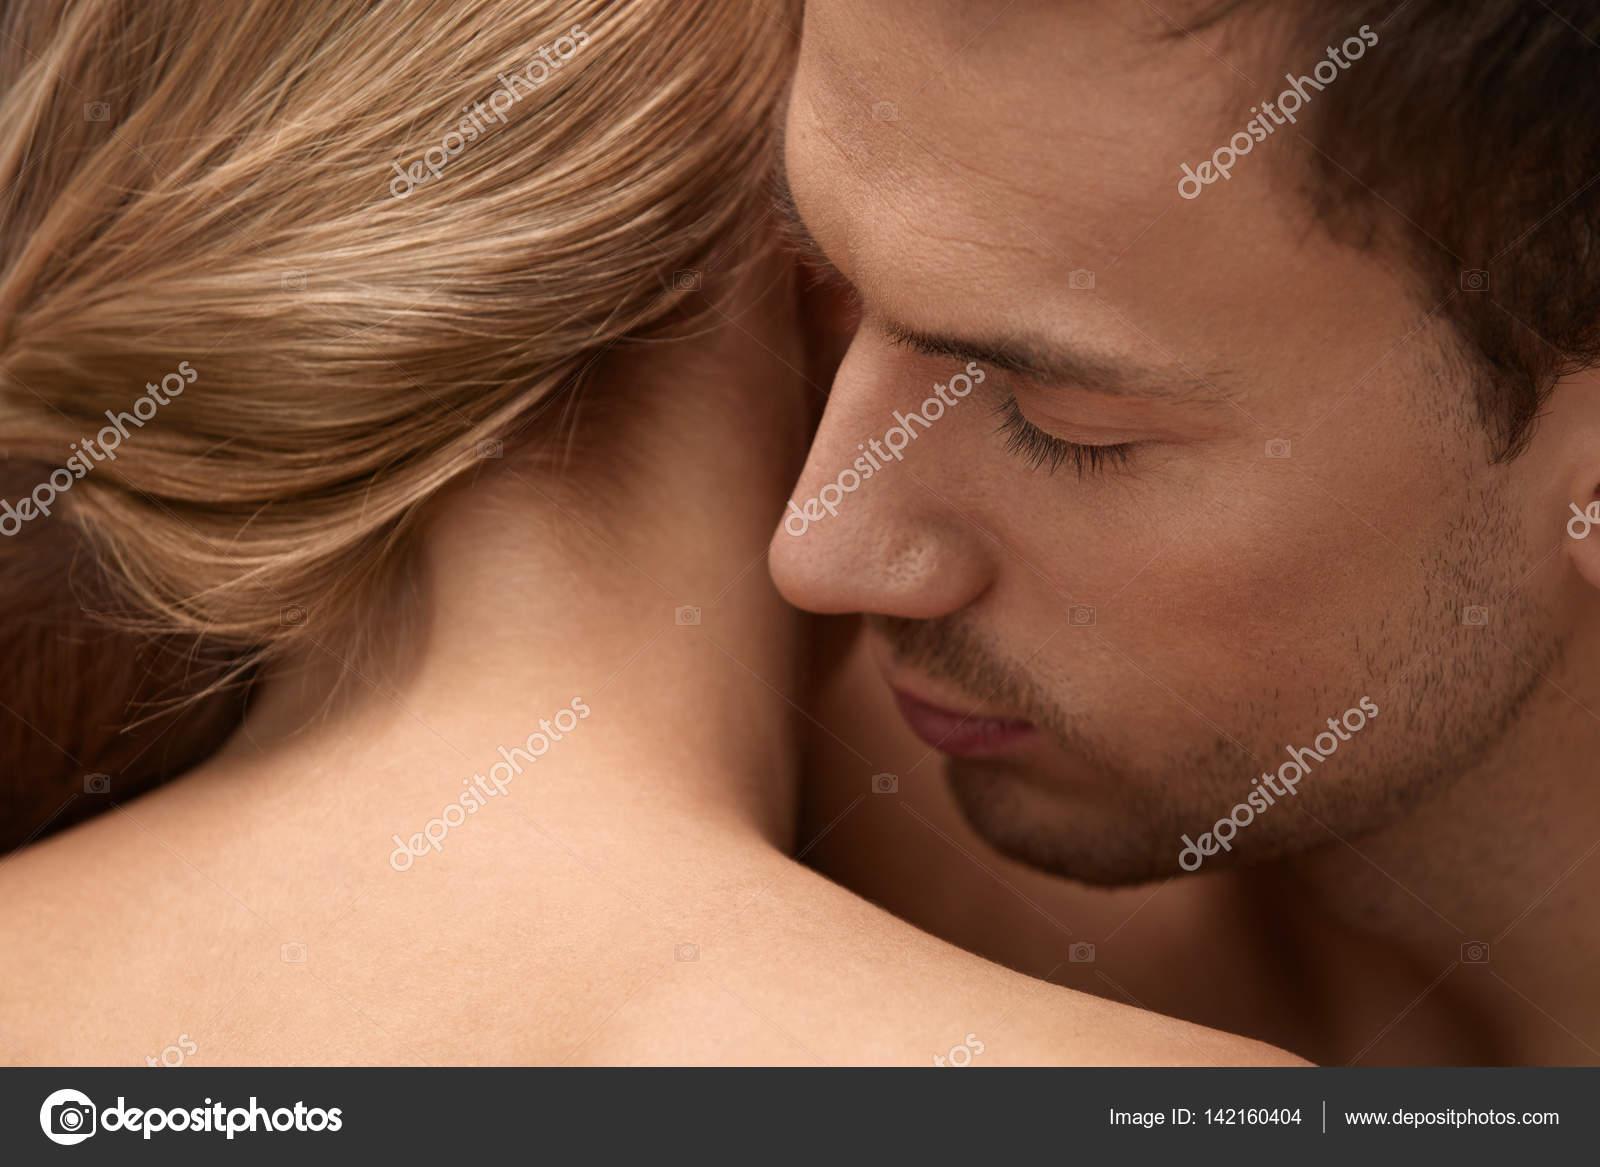 efd8ba726ef0 Skin Smell. Closeup Of Male Smelling Female Skin. Body Cosmetics — Stock  Photo